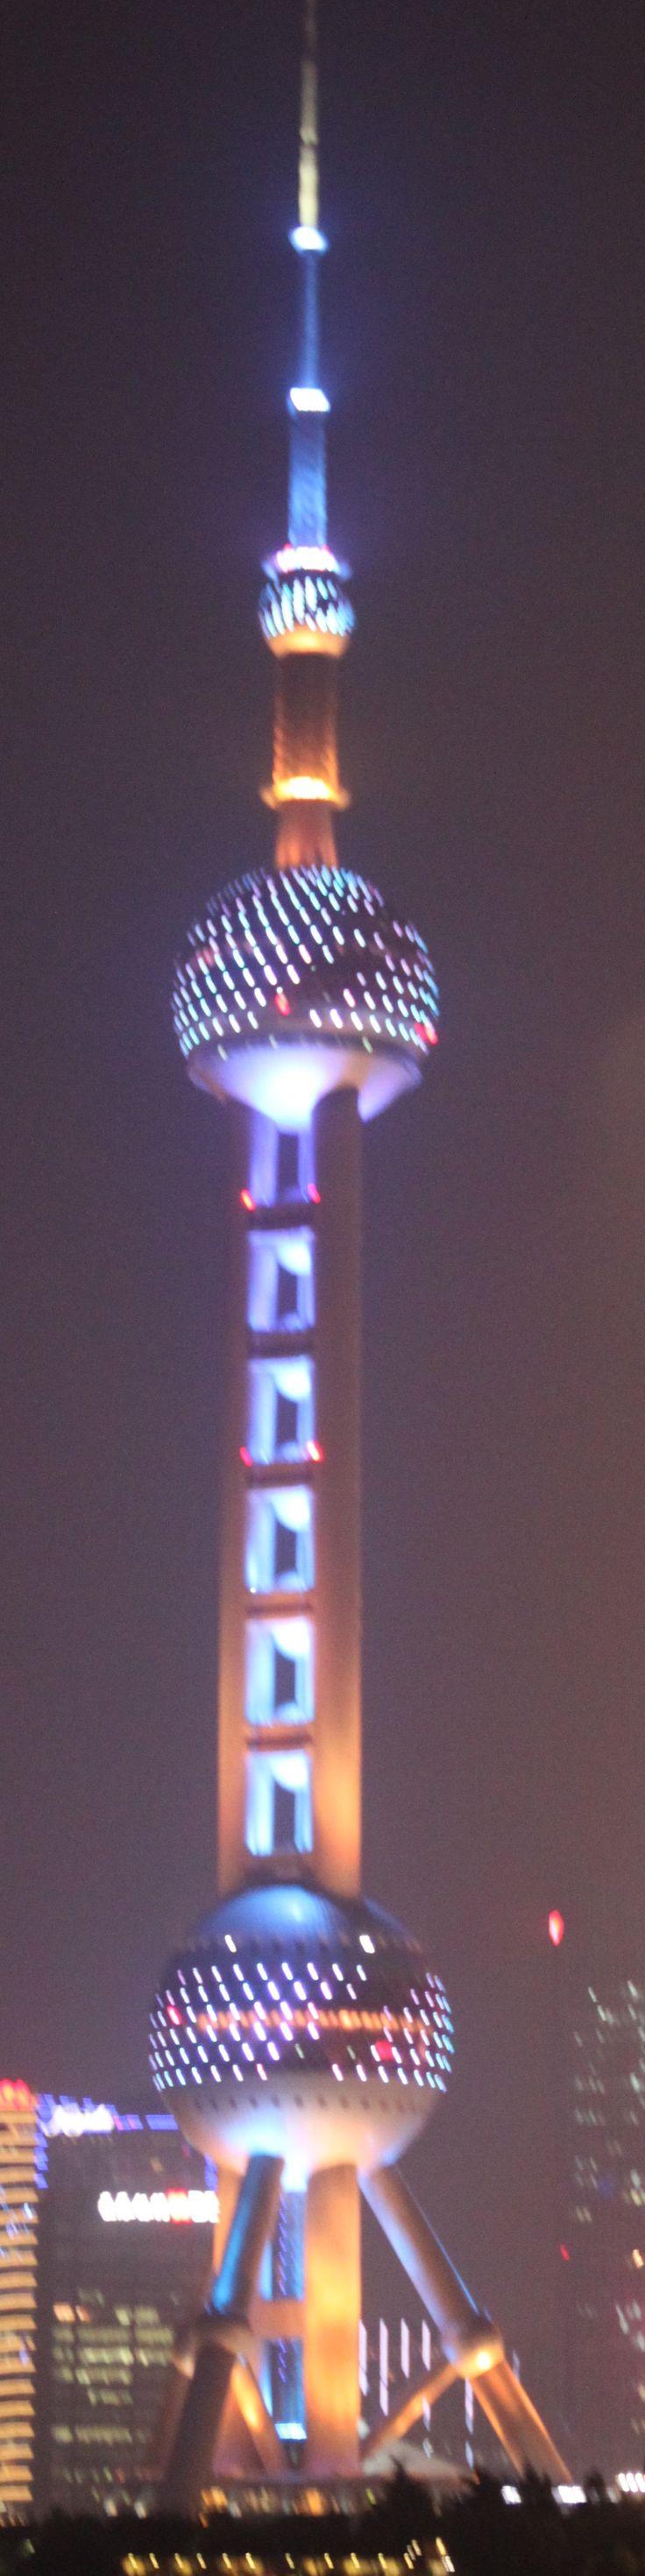 Night lights on the Bund,Pearl Tower